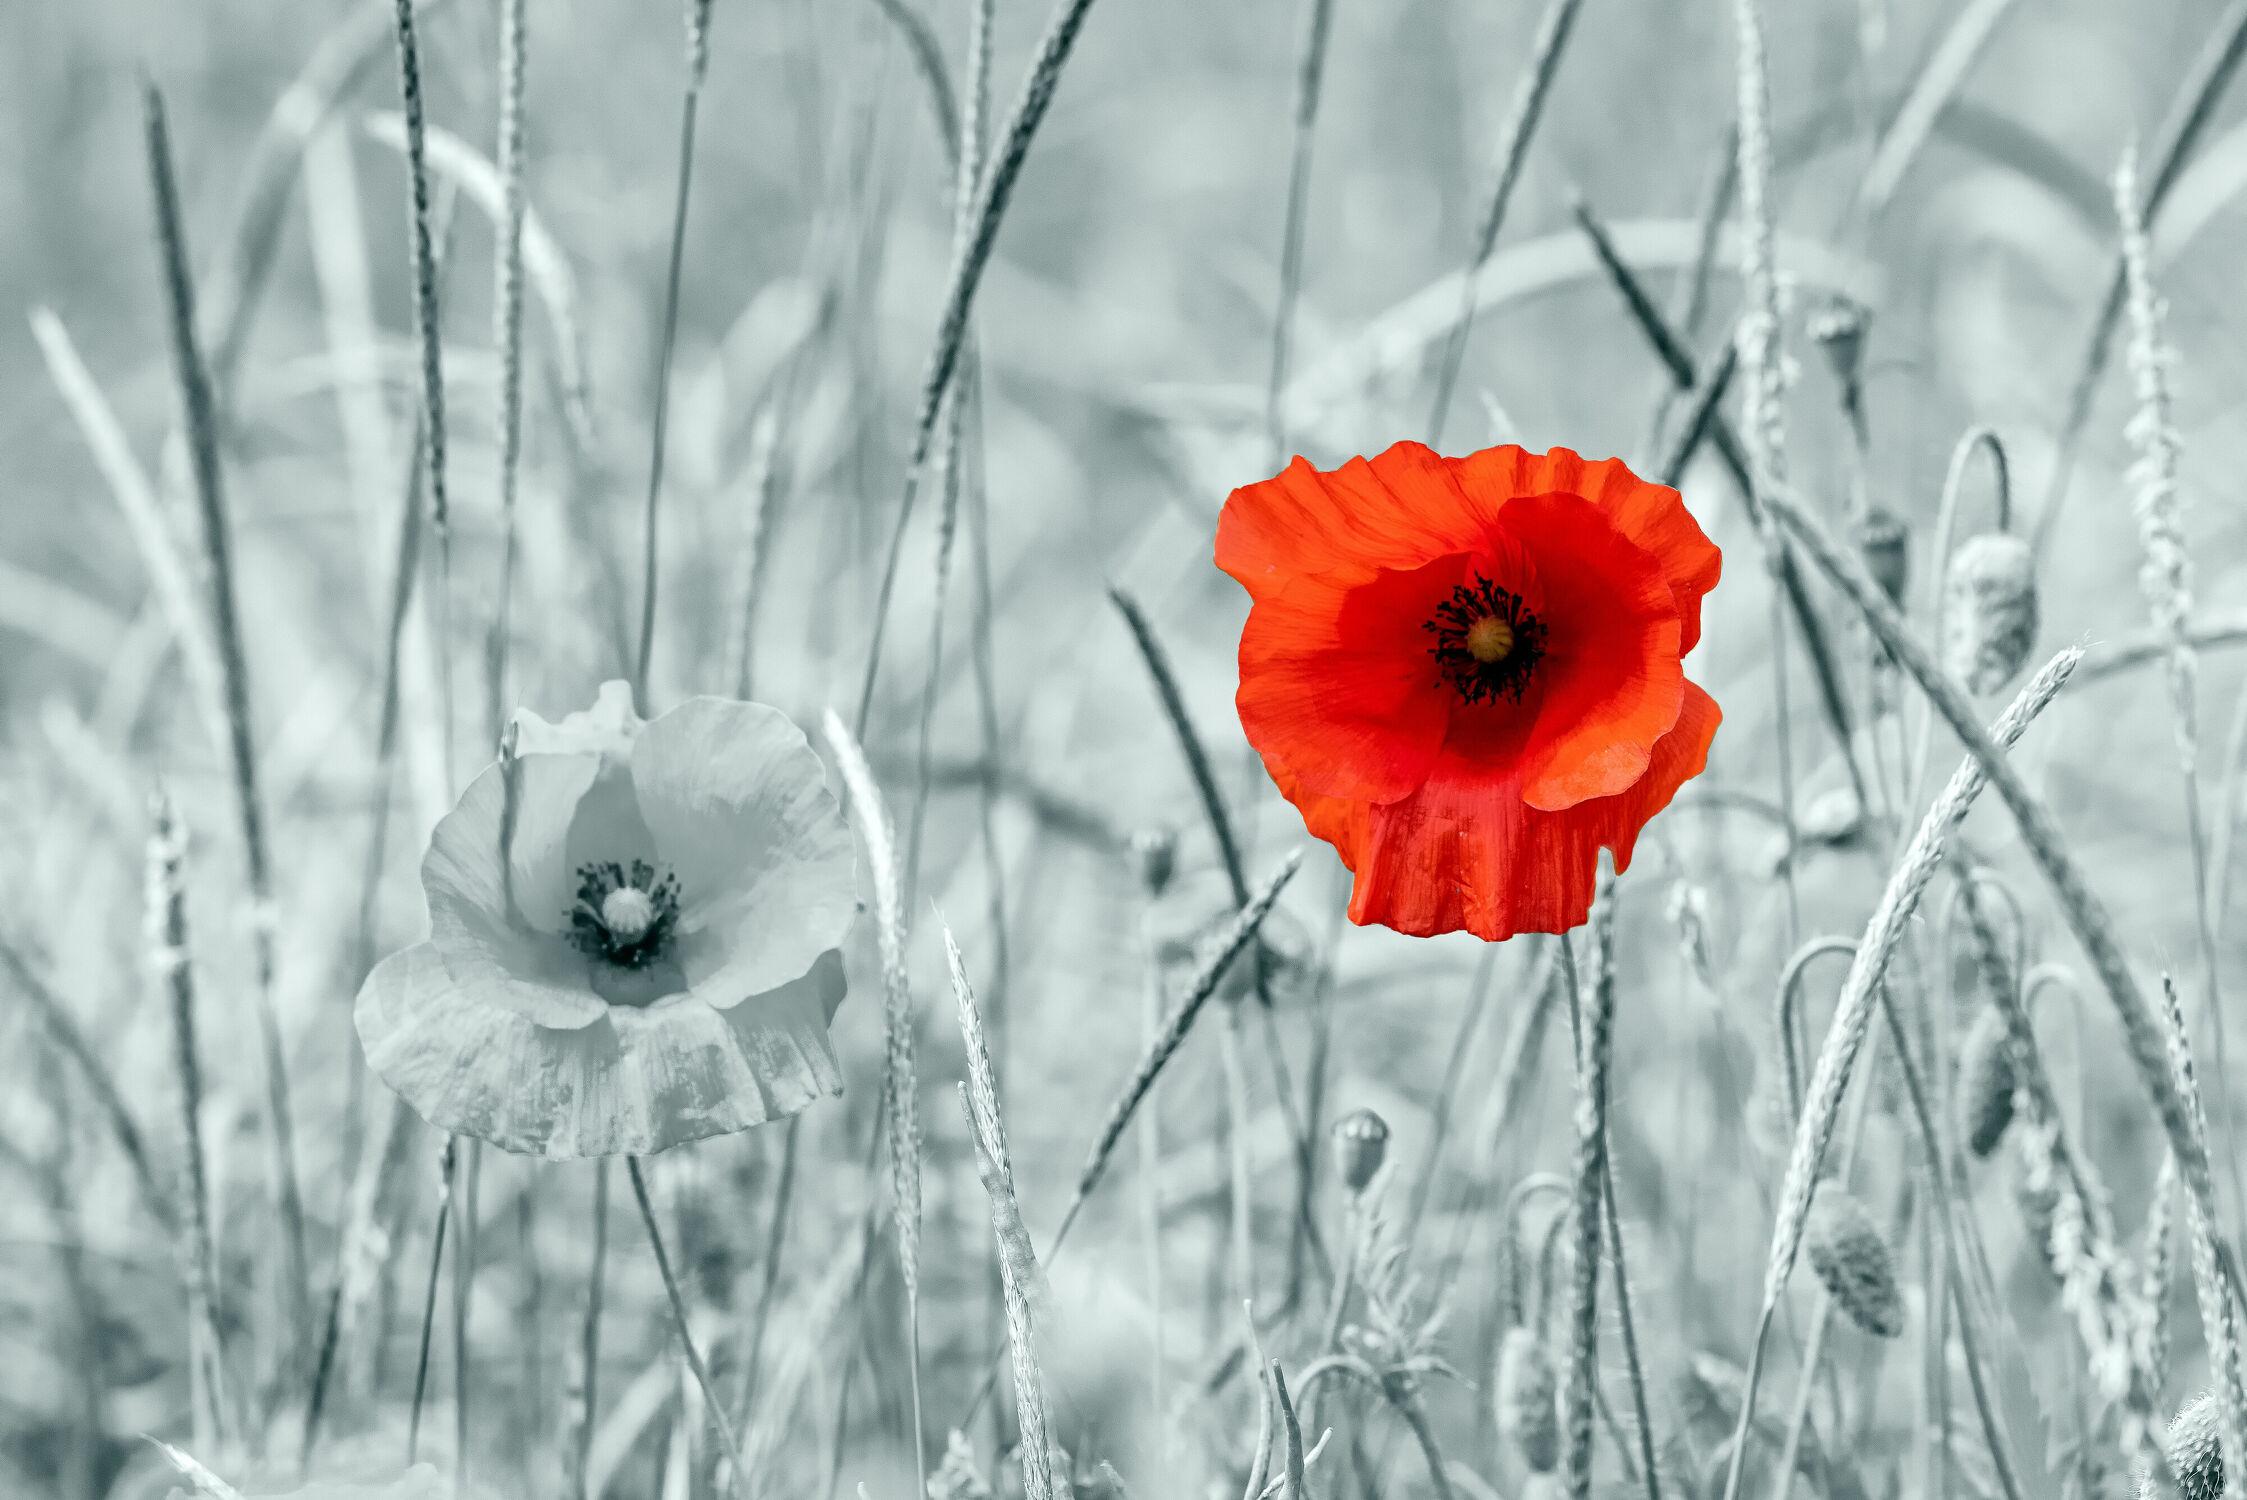 Bild mit Natur, Pflanzen, Rot, Mohn, Mohnblume, Licht, Feld, landwirtschaft, Schatten, colour key